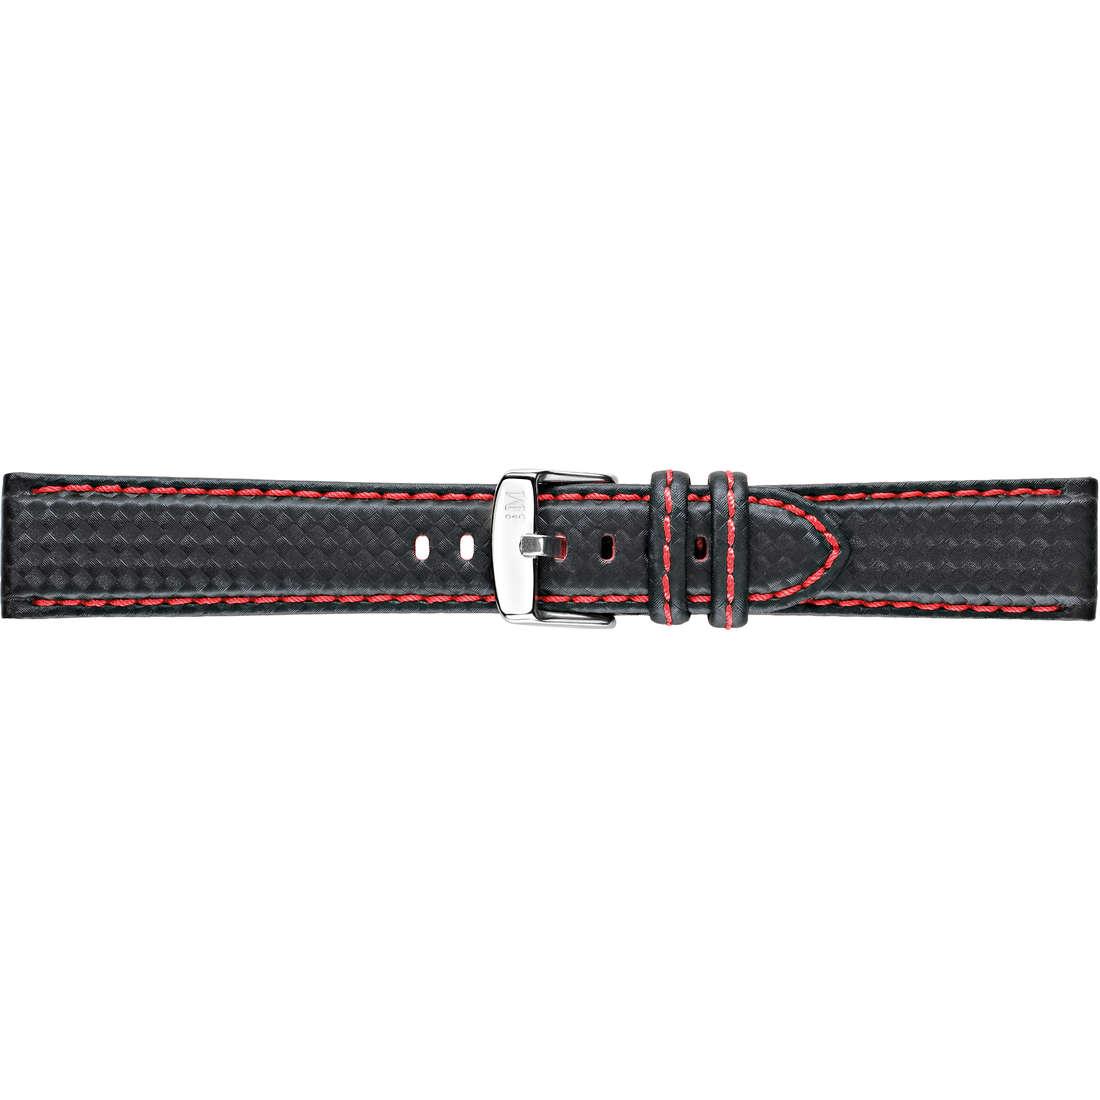 watch watch bands watch straps man Morellato Linea Sport A01U3586977883CR22